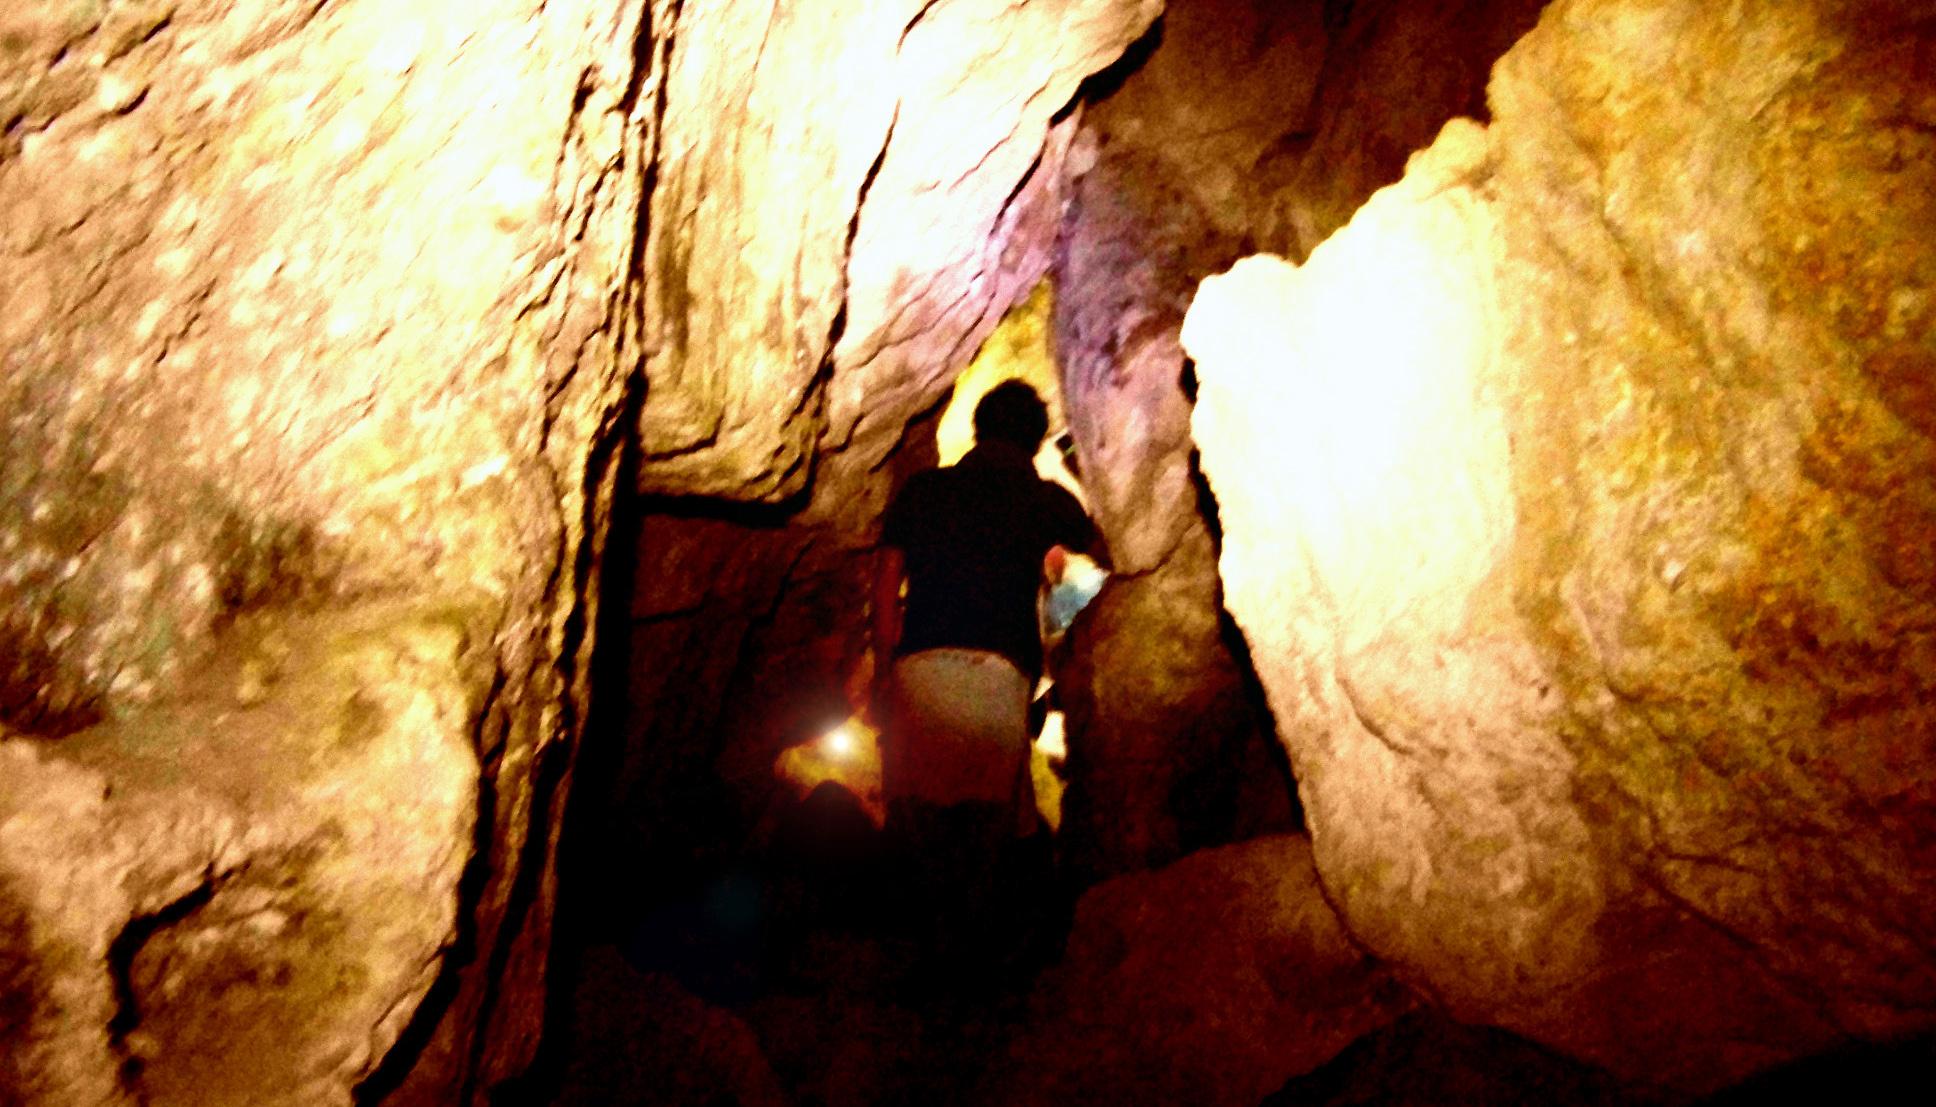 speleo trekking escursioni grotte puglia www.pugliavventura.com